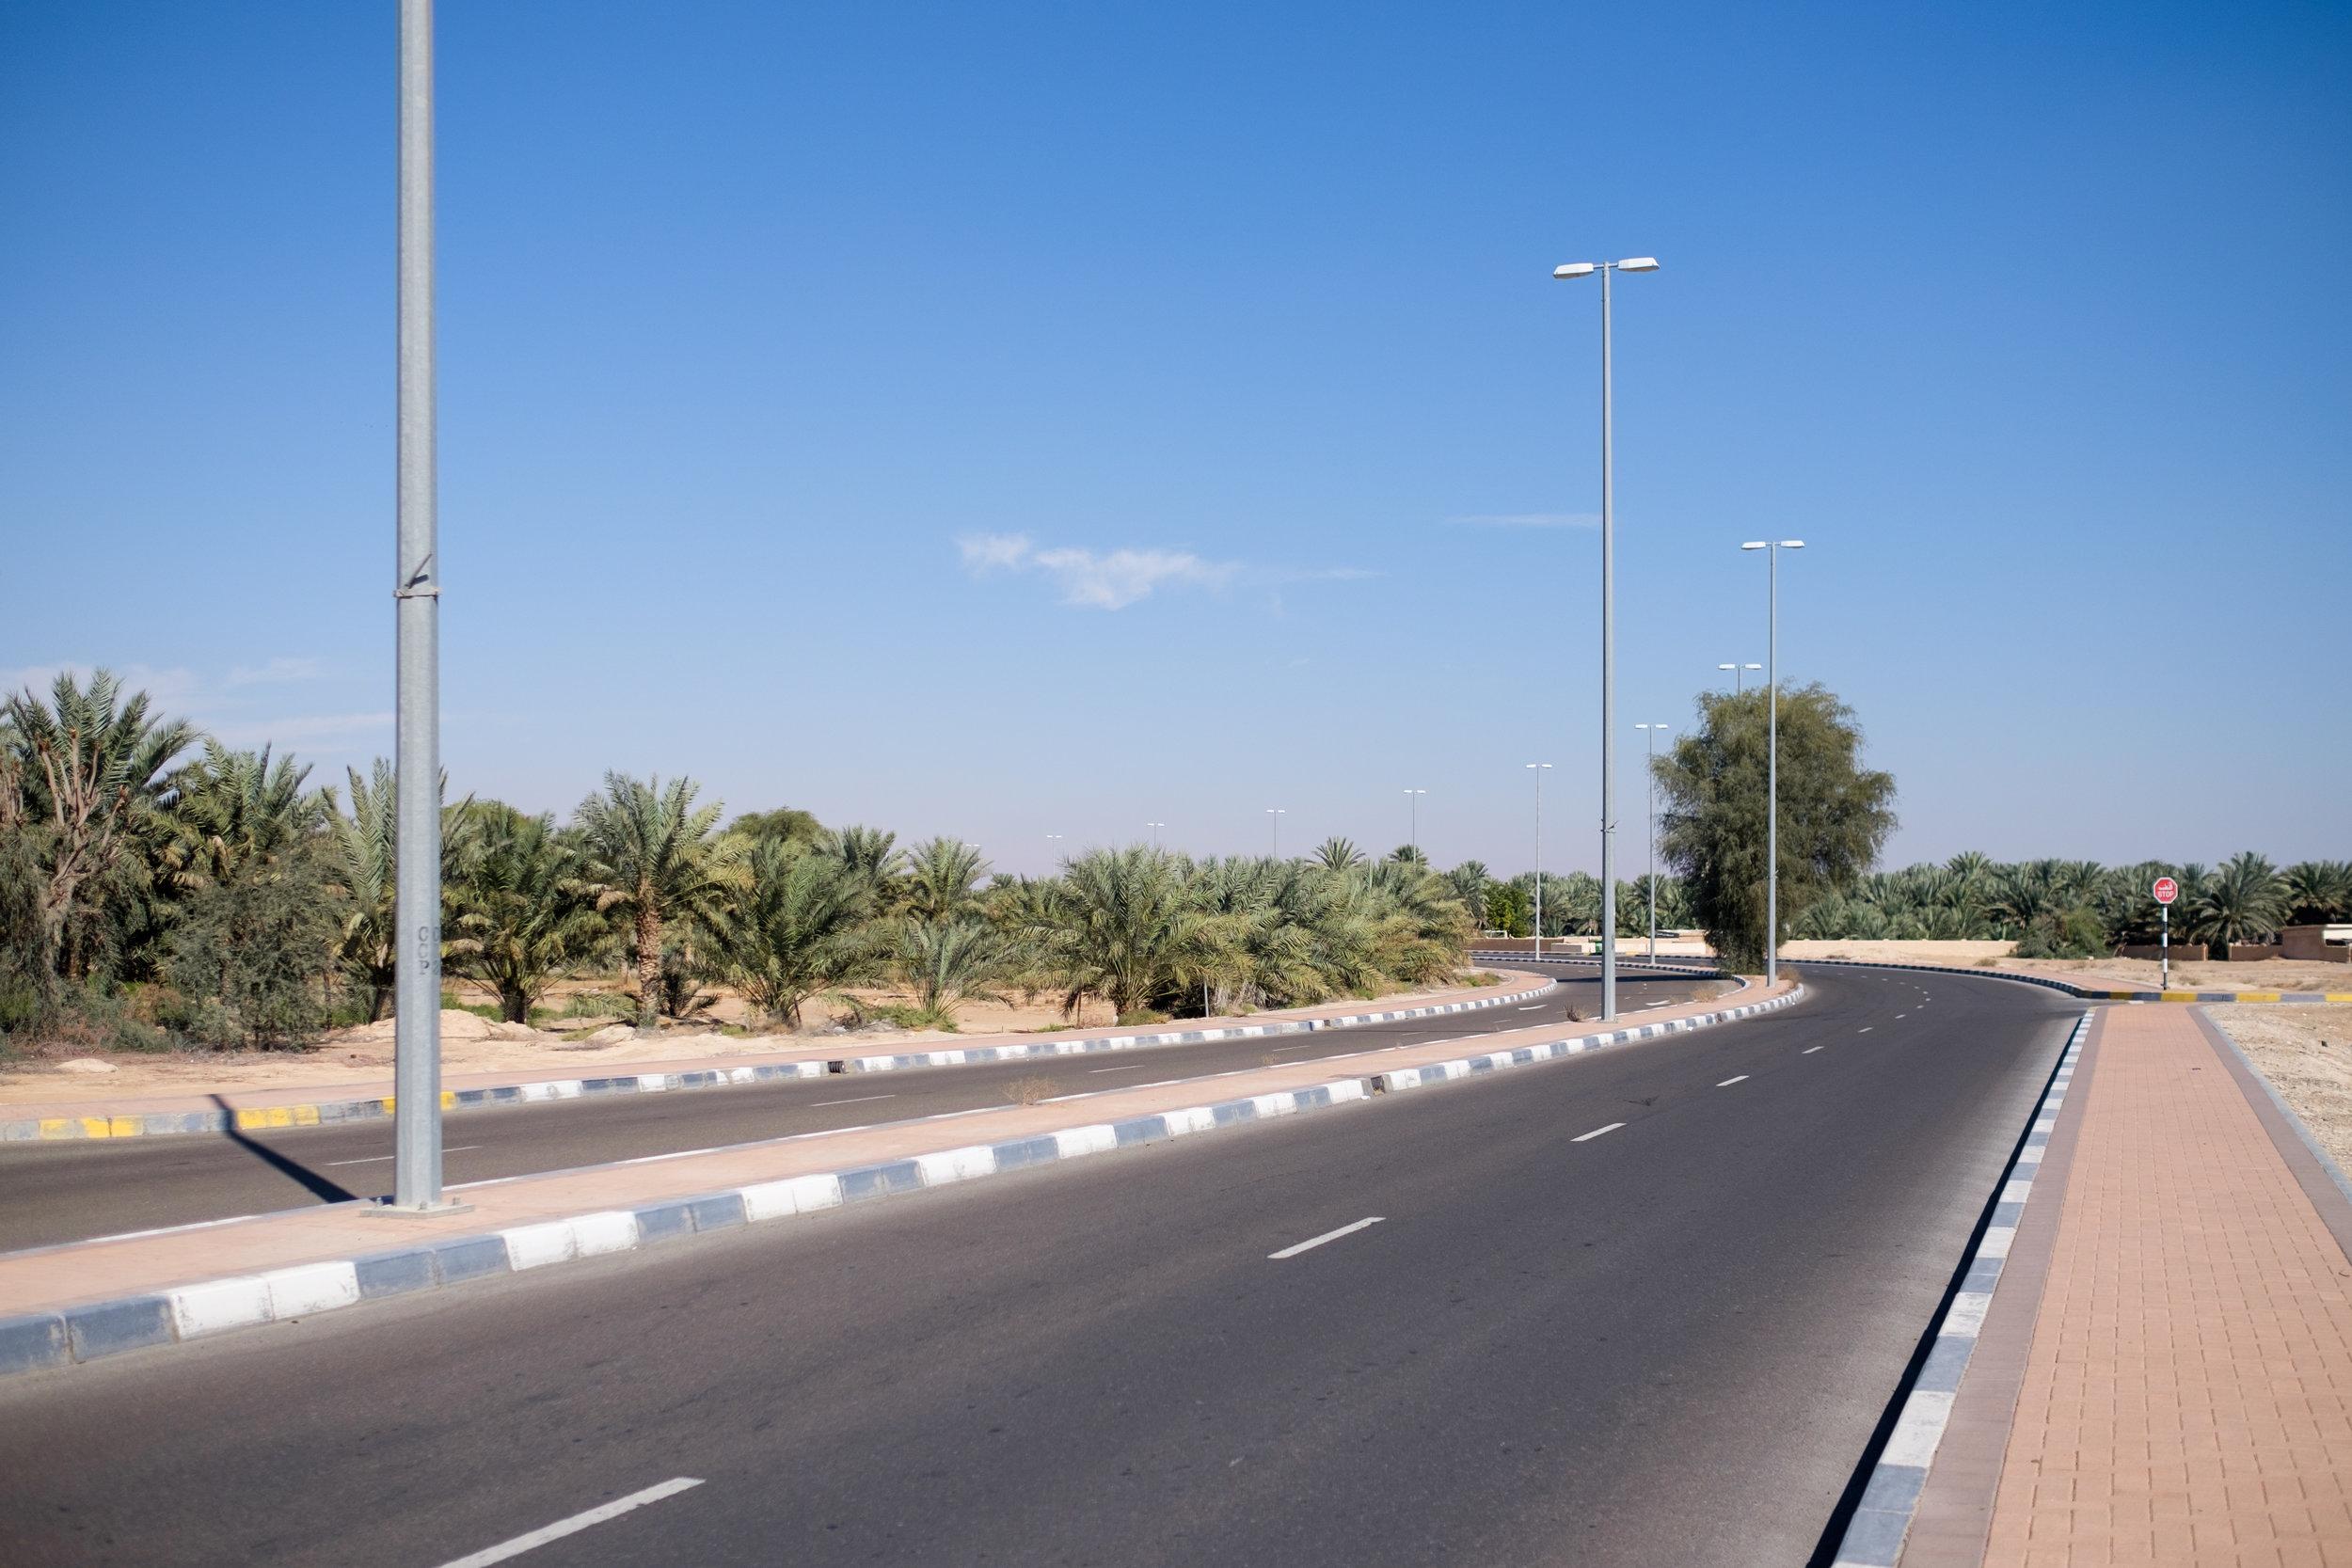 al-ain-outskirts-6123.jpg